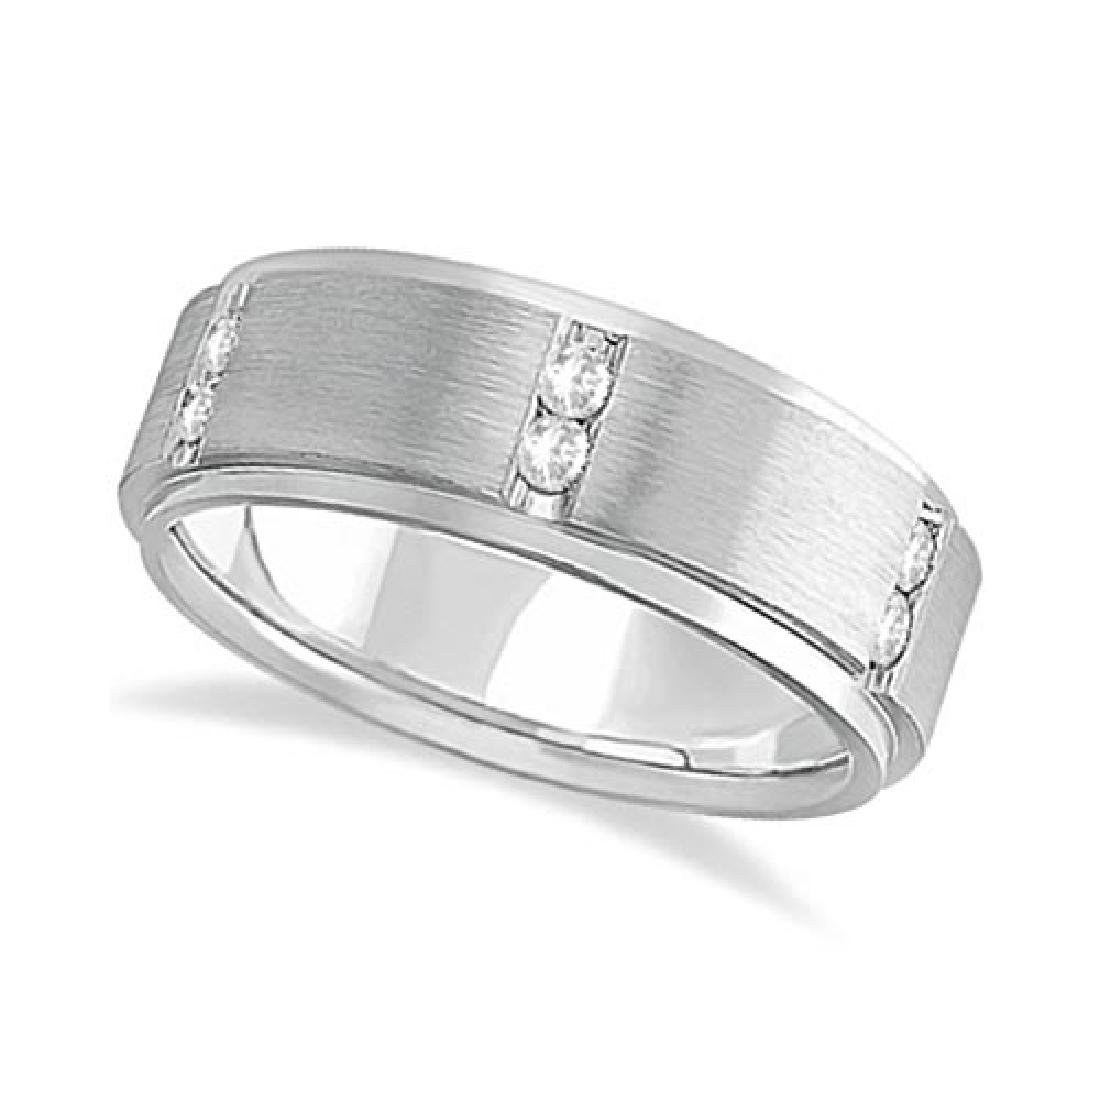 Mens Channel Set Wide Band Diamond Wedding Ring 14k Whi